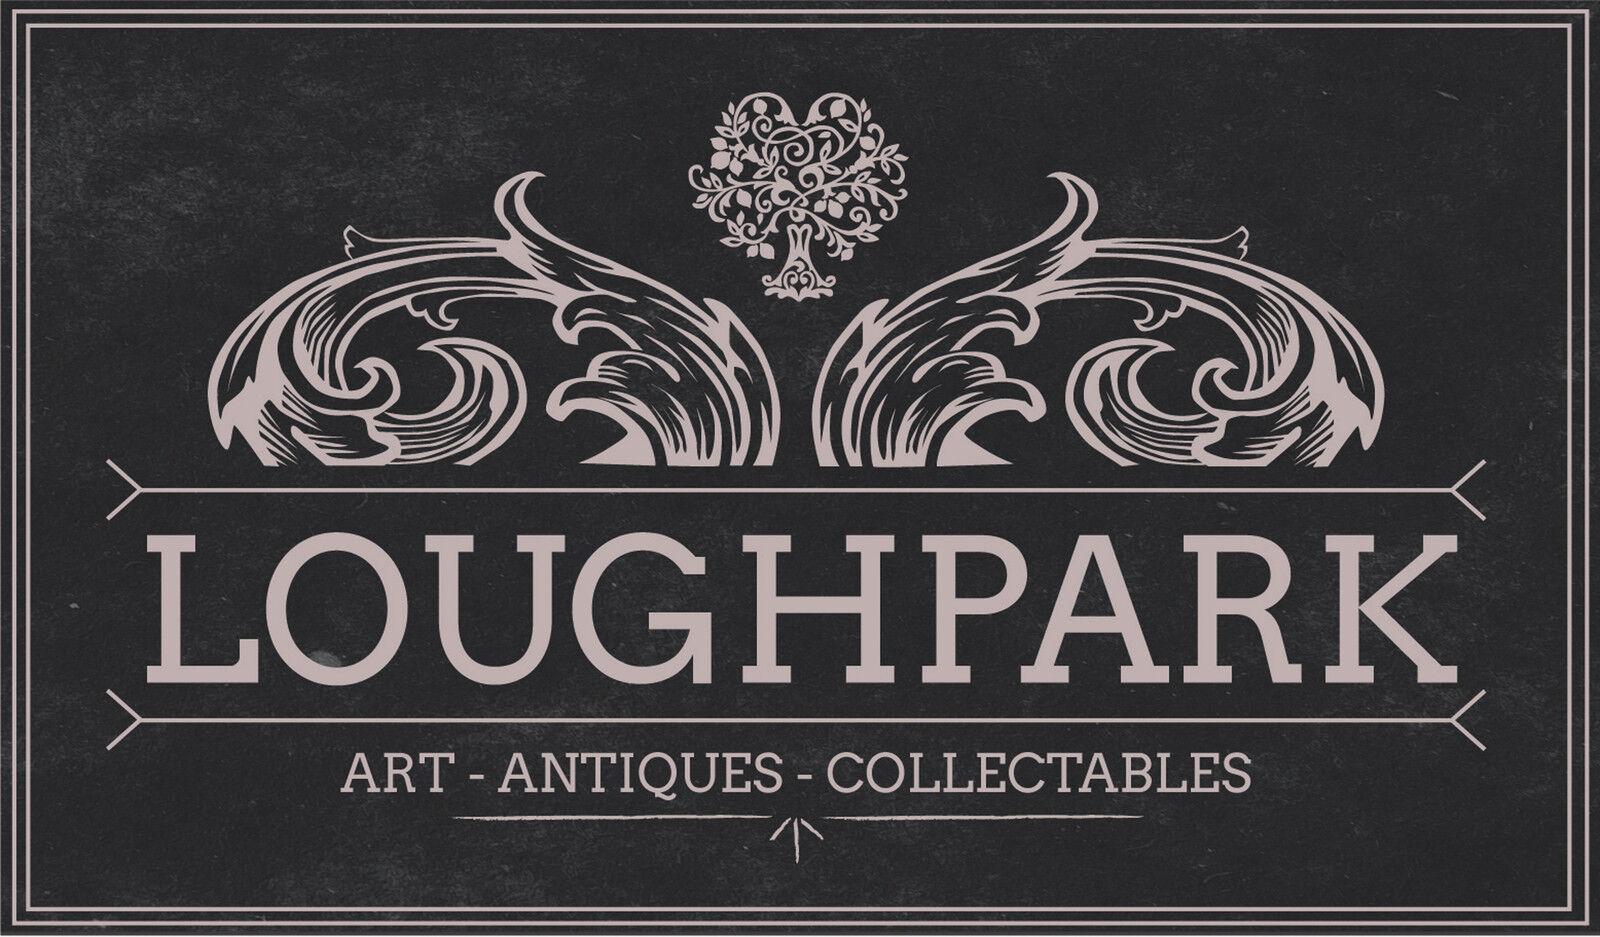 Loughpark Art Antiques Collectables